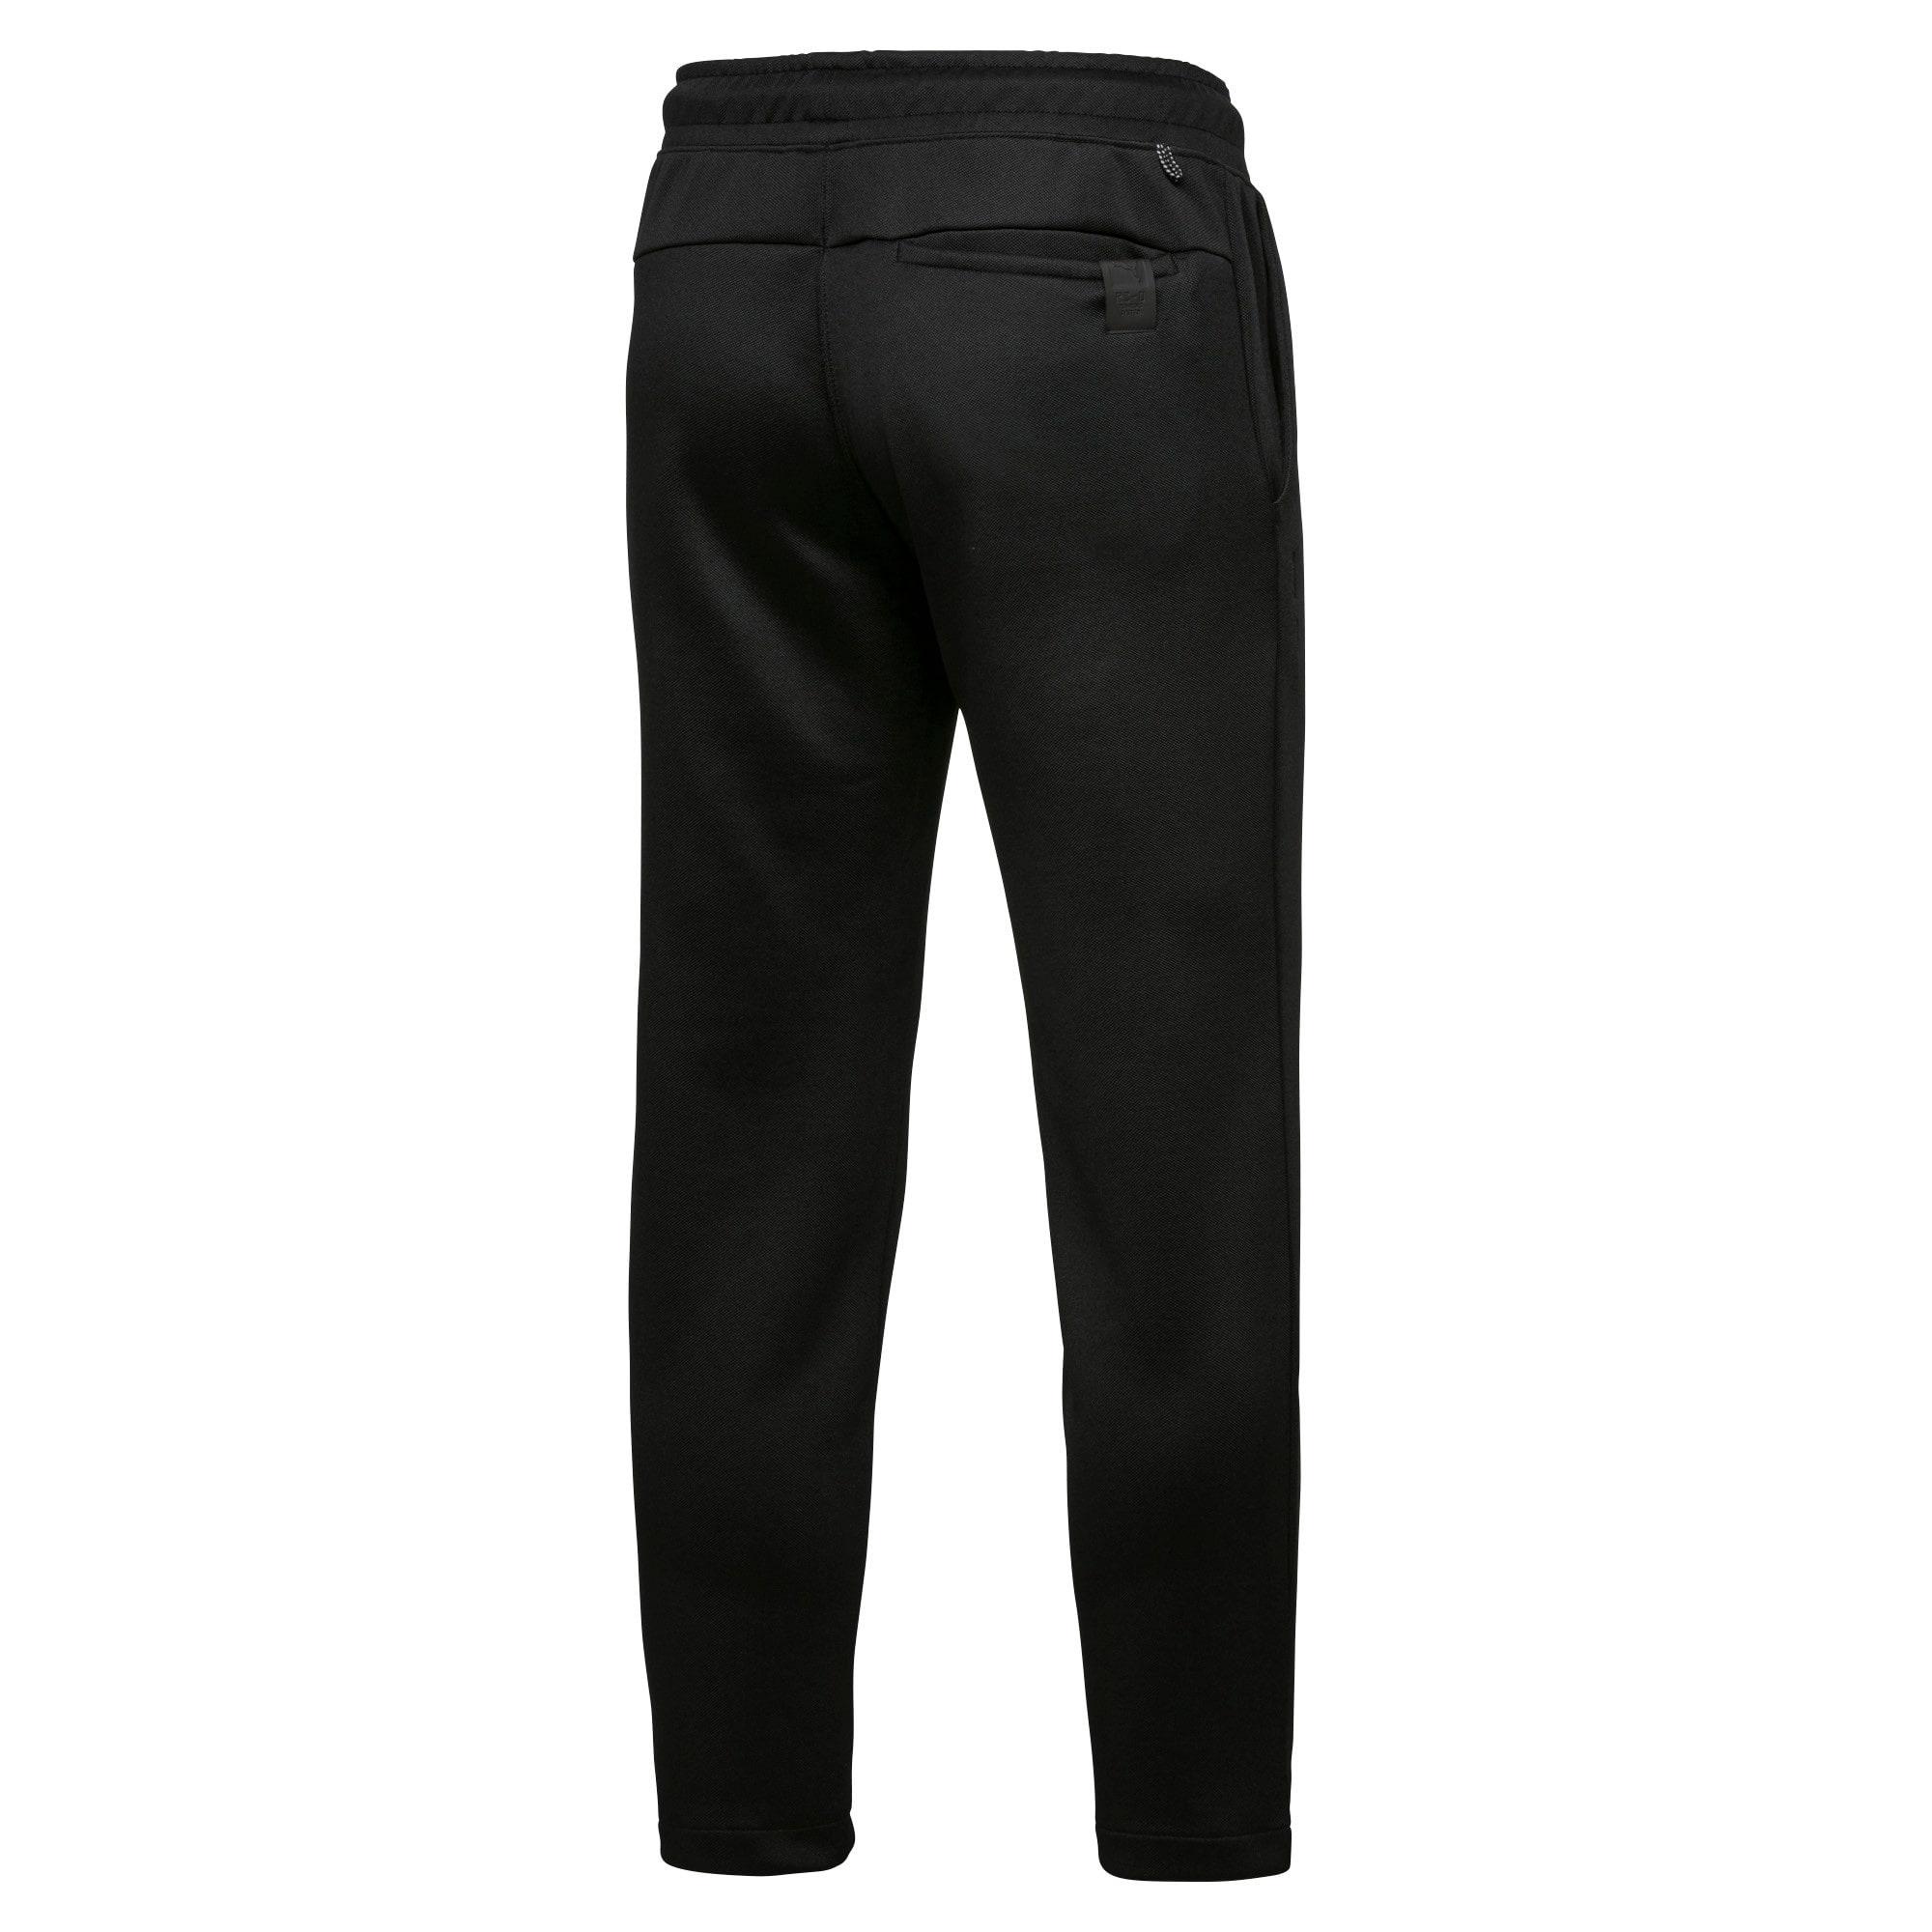 Thumbnail 2 of RS-0 CAPSULE PANTS, Puma Black, medium-JPN